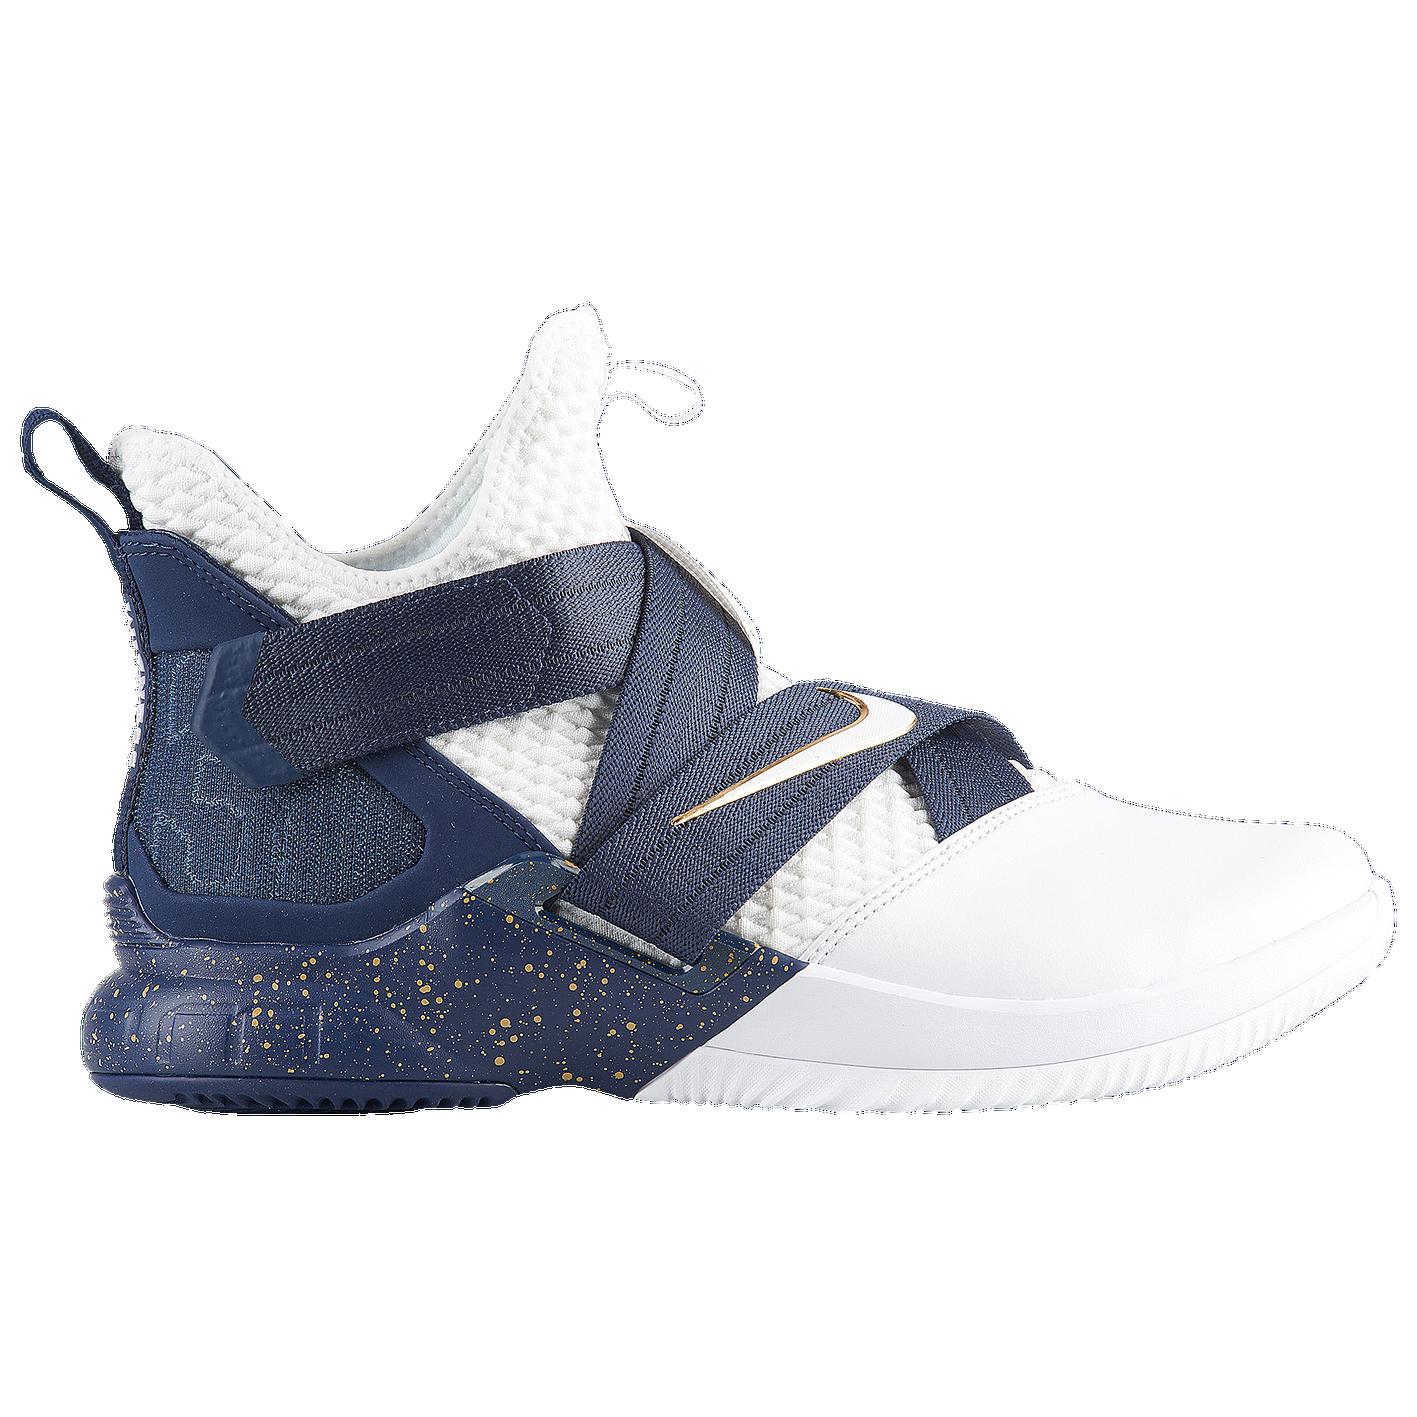 61adb2b4b6a Nike LeBron Soldier XII SFG - Boys  Preschool - Basketball - Shoes ...